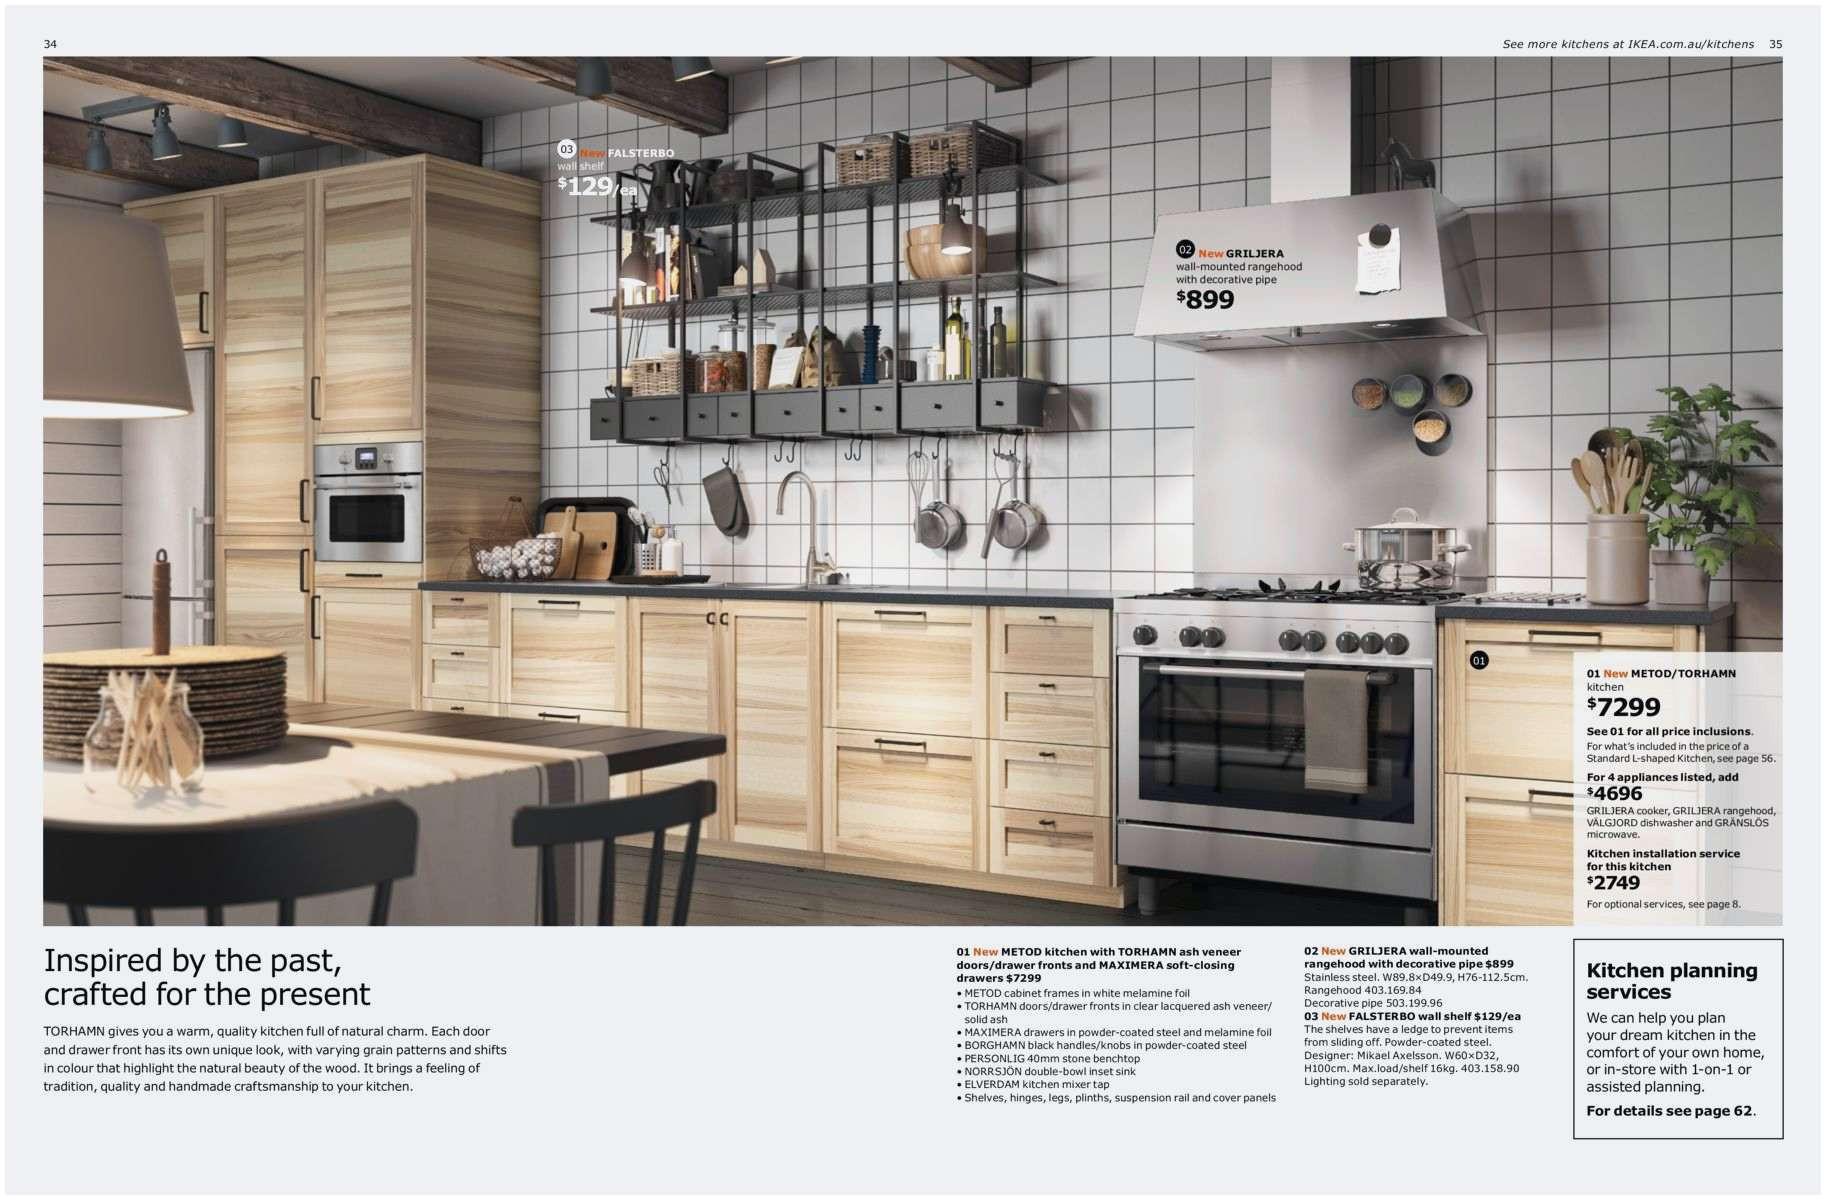 Metod Keuken Ikea : Installing cover panel on ikea dishwasher ikea keuken brochure